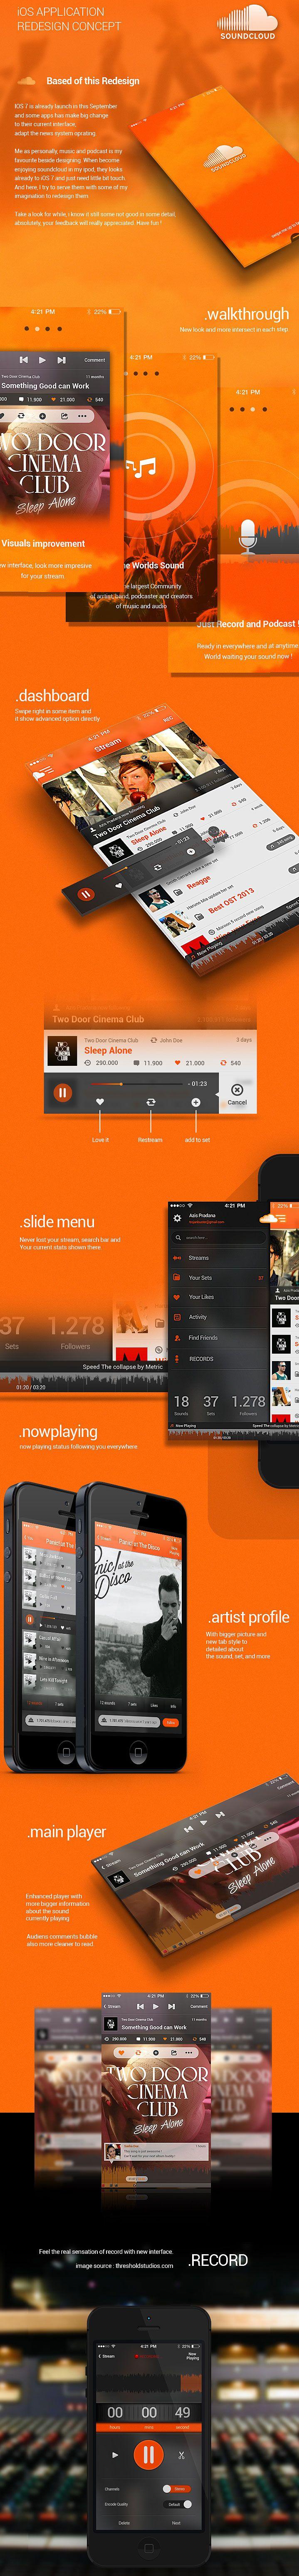 Soundcloud iOS | Redesign by Azis Pradana, via Behance *** #app #gui #ui #behance